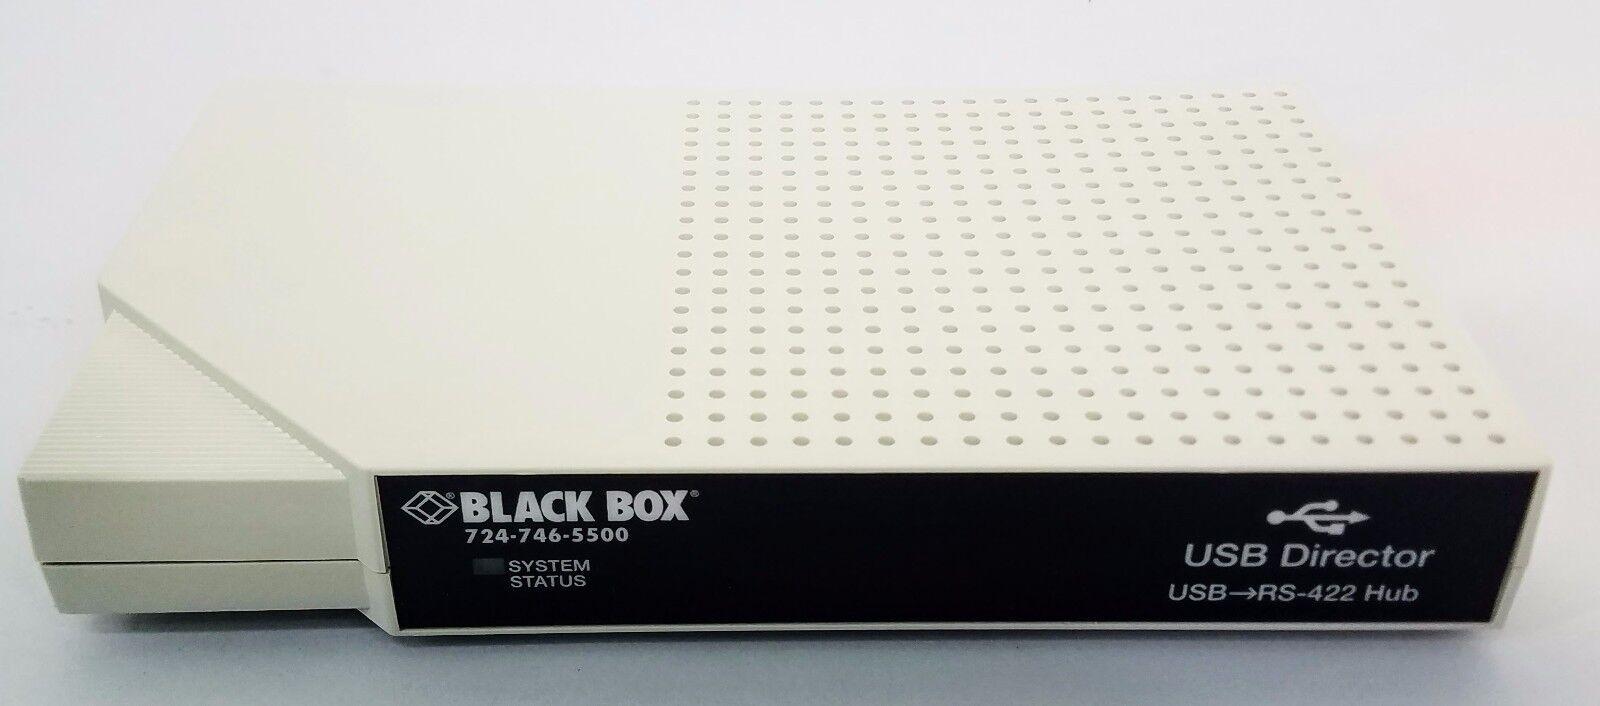 New Black Box USB Director USB-RS422 4 Port Hub Stackable Module